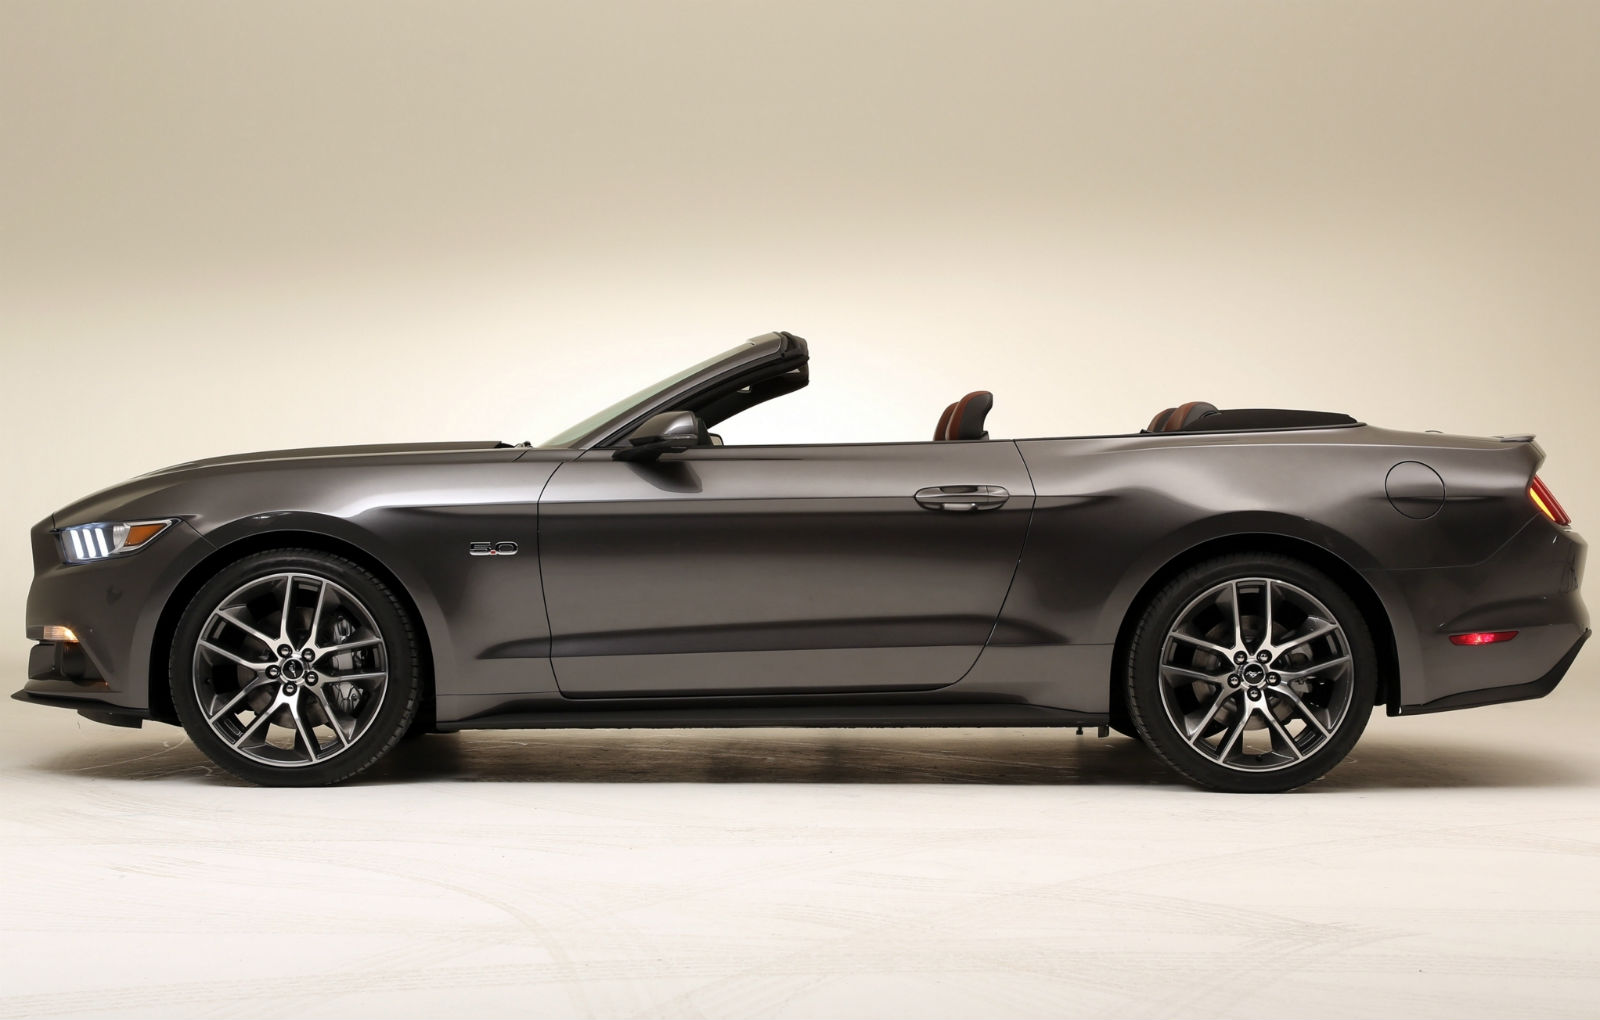 2015 Ford Mustang Convertible Wallpaper   HD 1600x1020